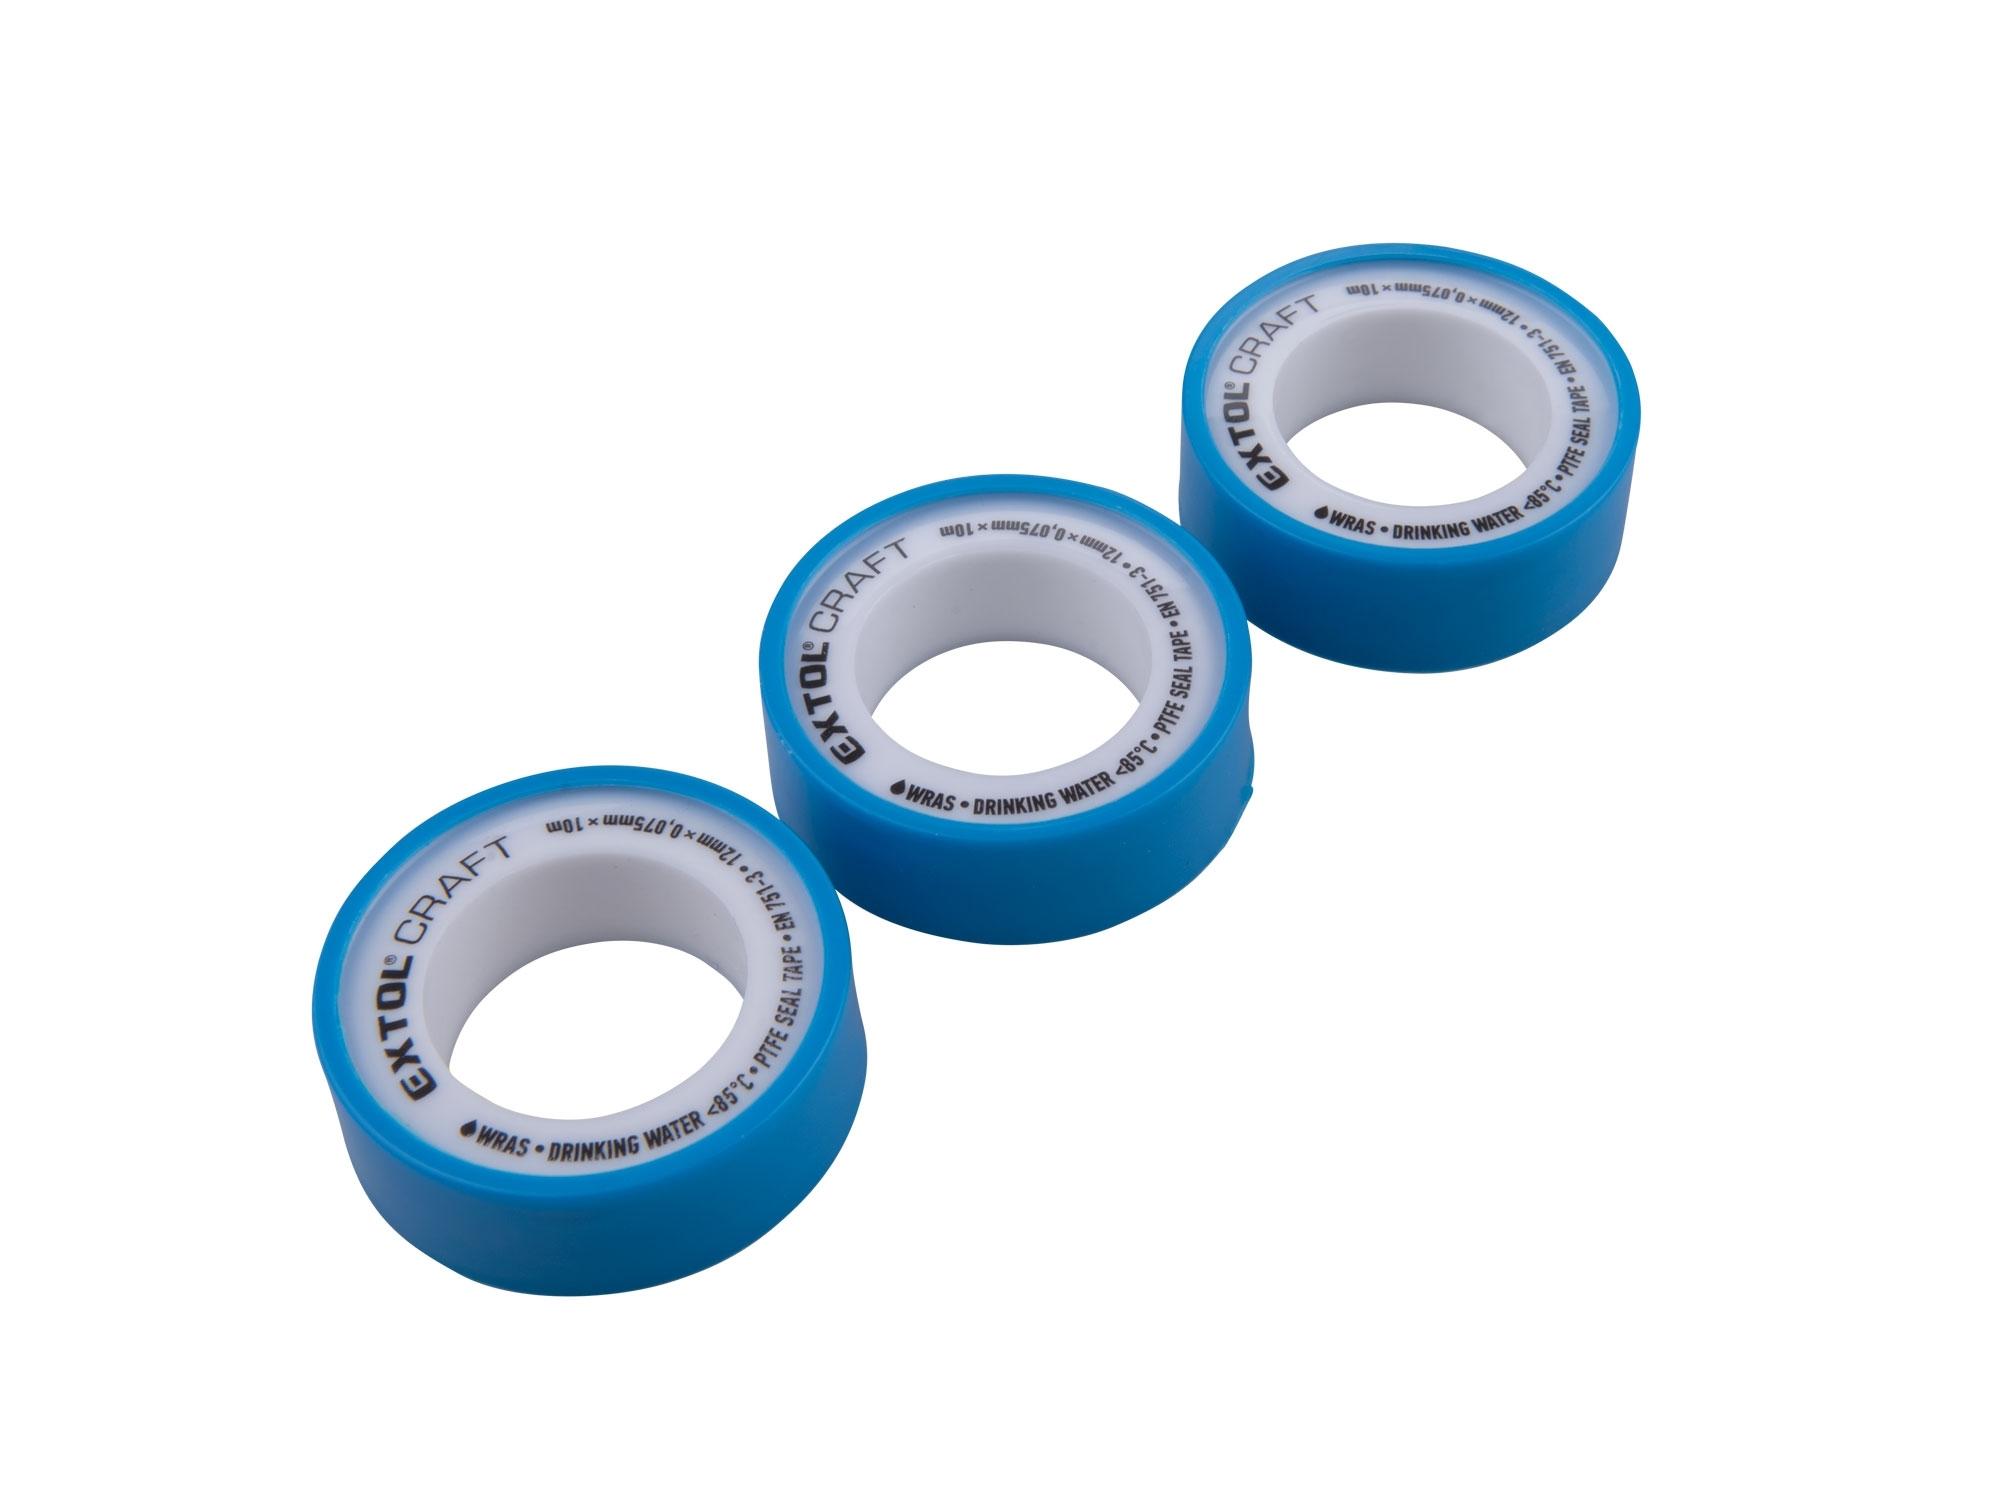 páska izolační teflonová, sada 3ks, 12mm x 10m, EXTOL CRAFT 47530